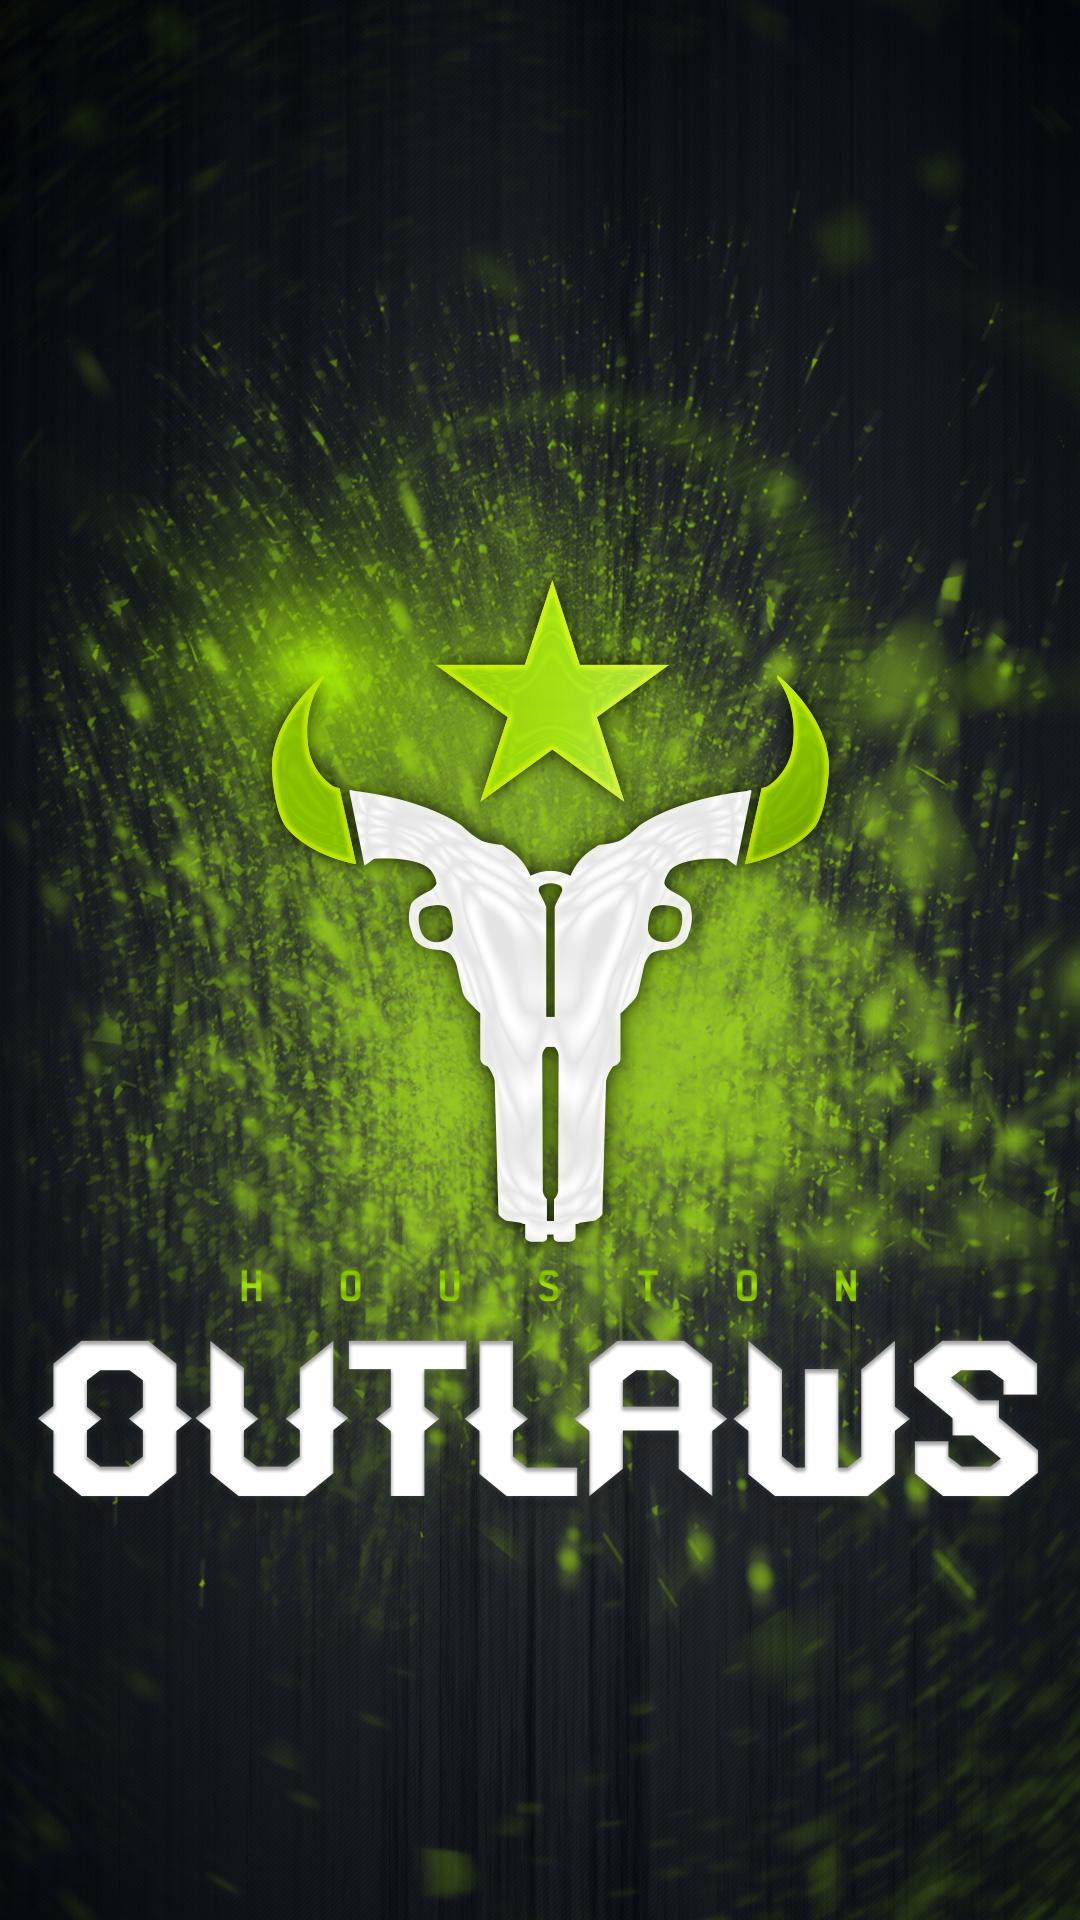 Wallpaper Overwatch League Houston Outlaws E Sports 1080x1920